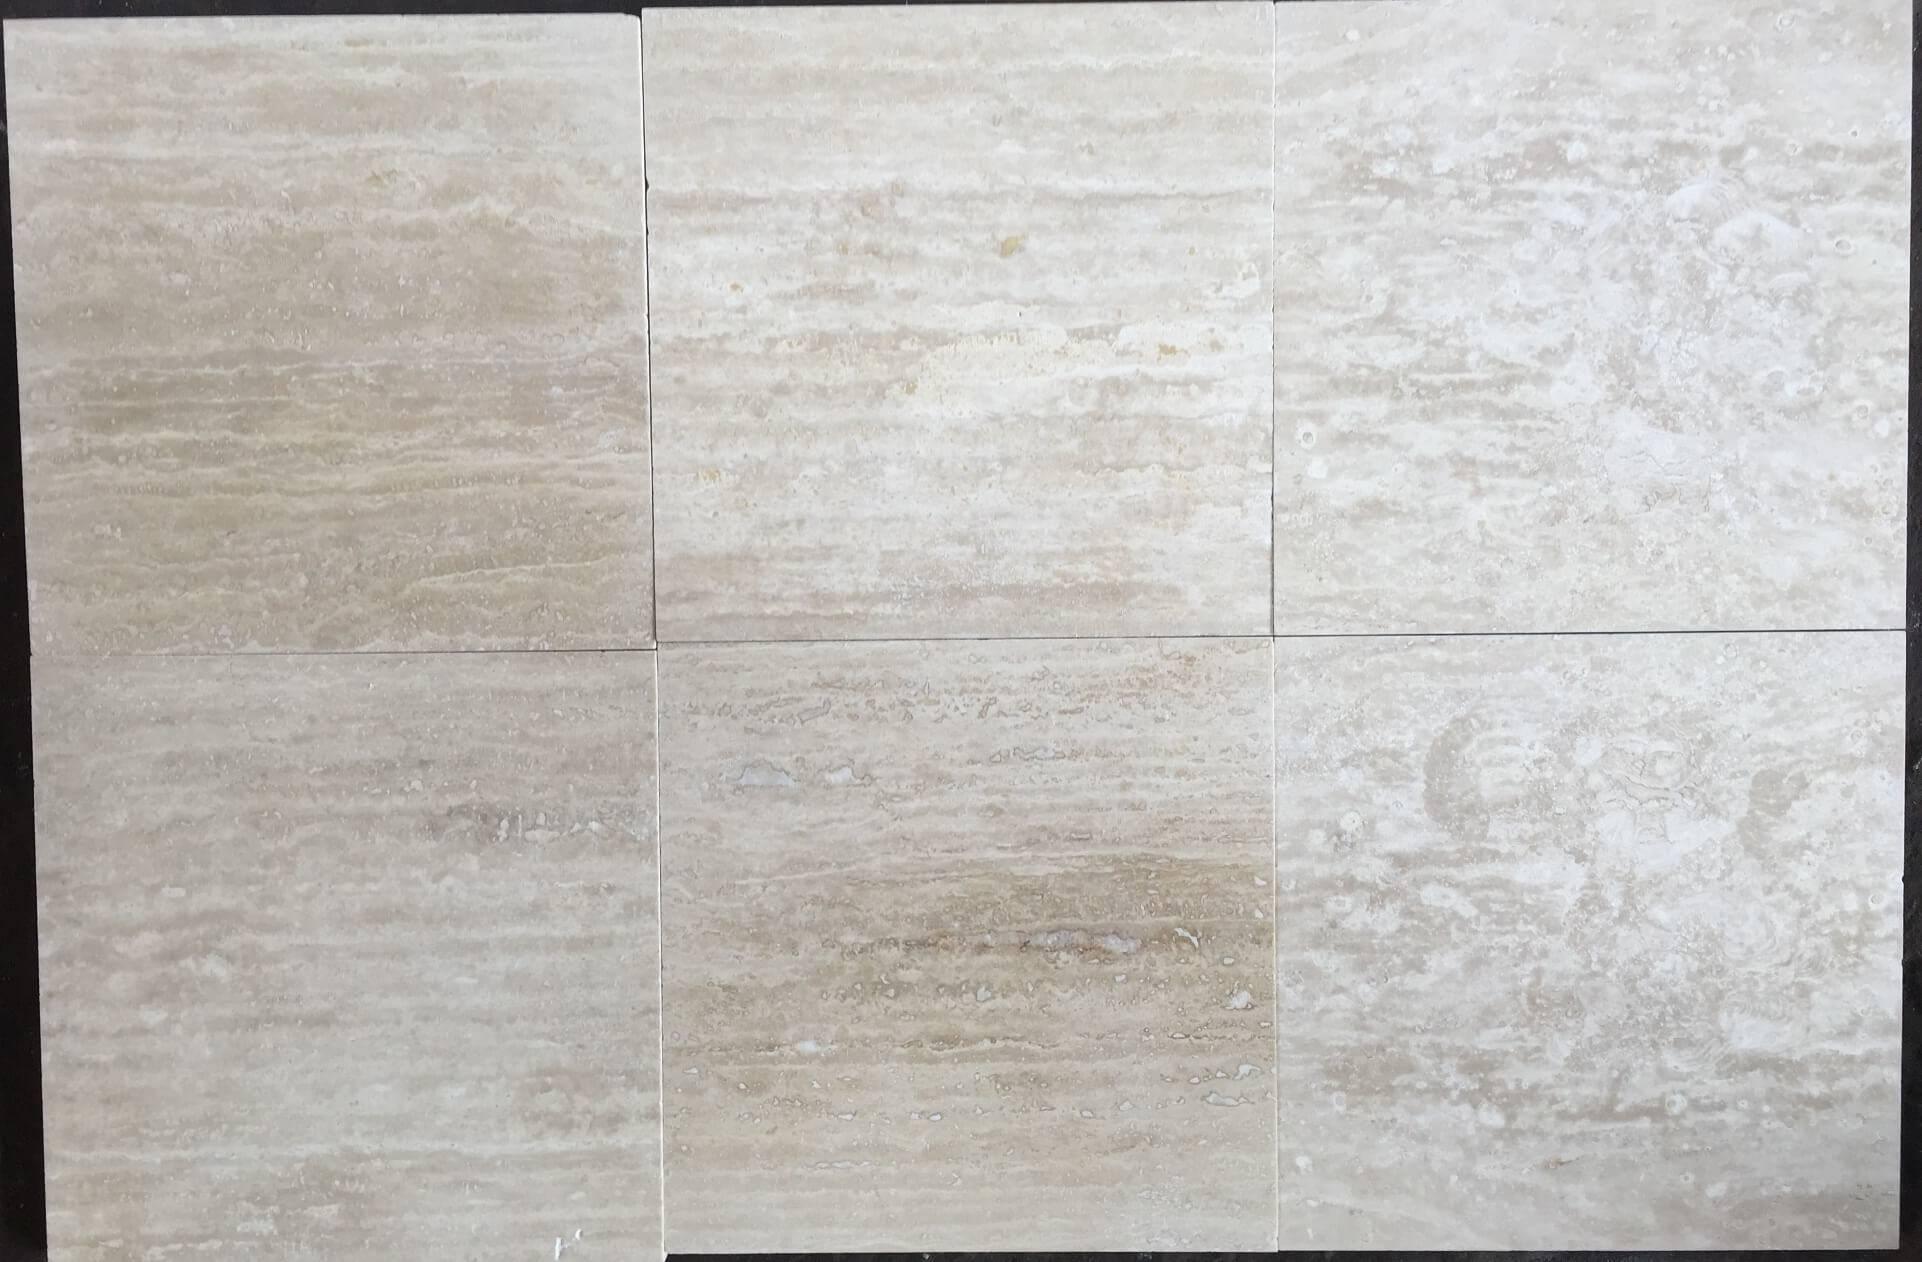 30,5x30,5 travertine vein-cut заполненный фото 1 — изелия и проекты от Bevers Marmyr